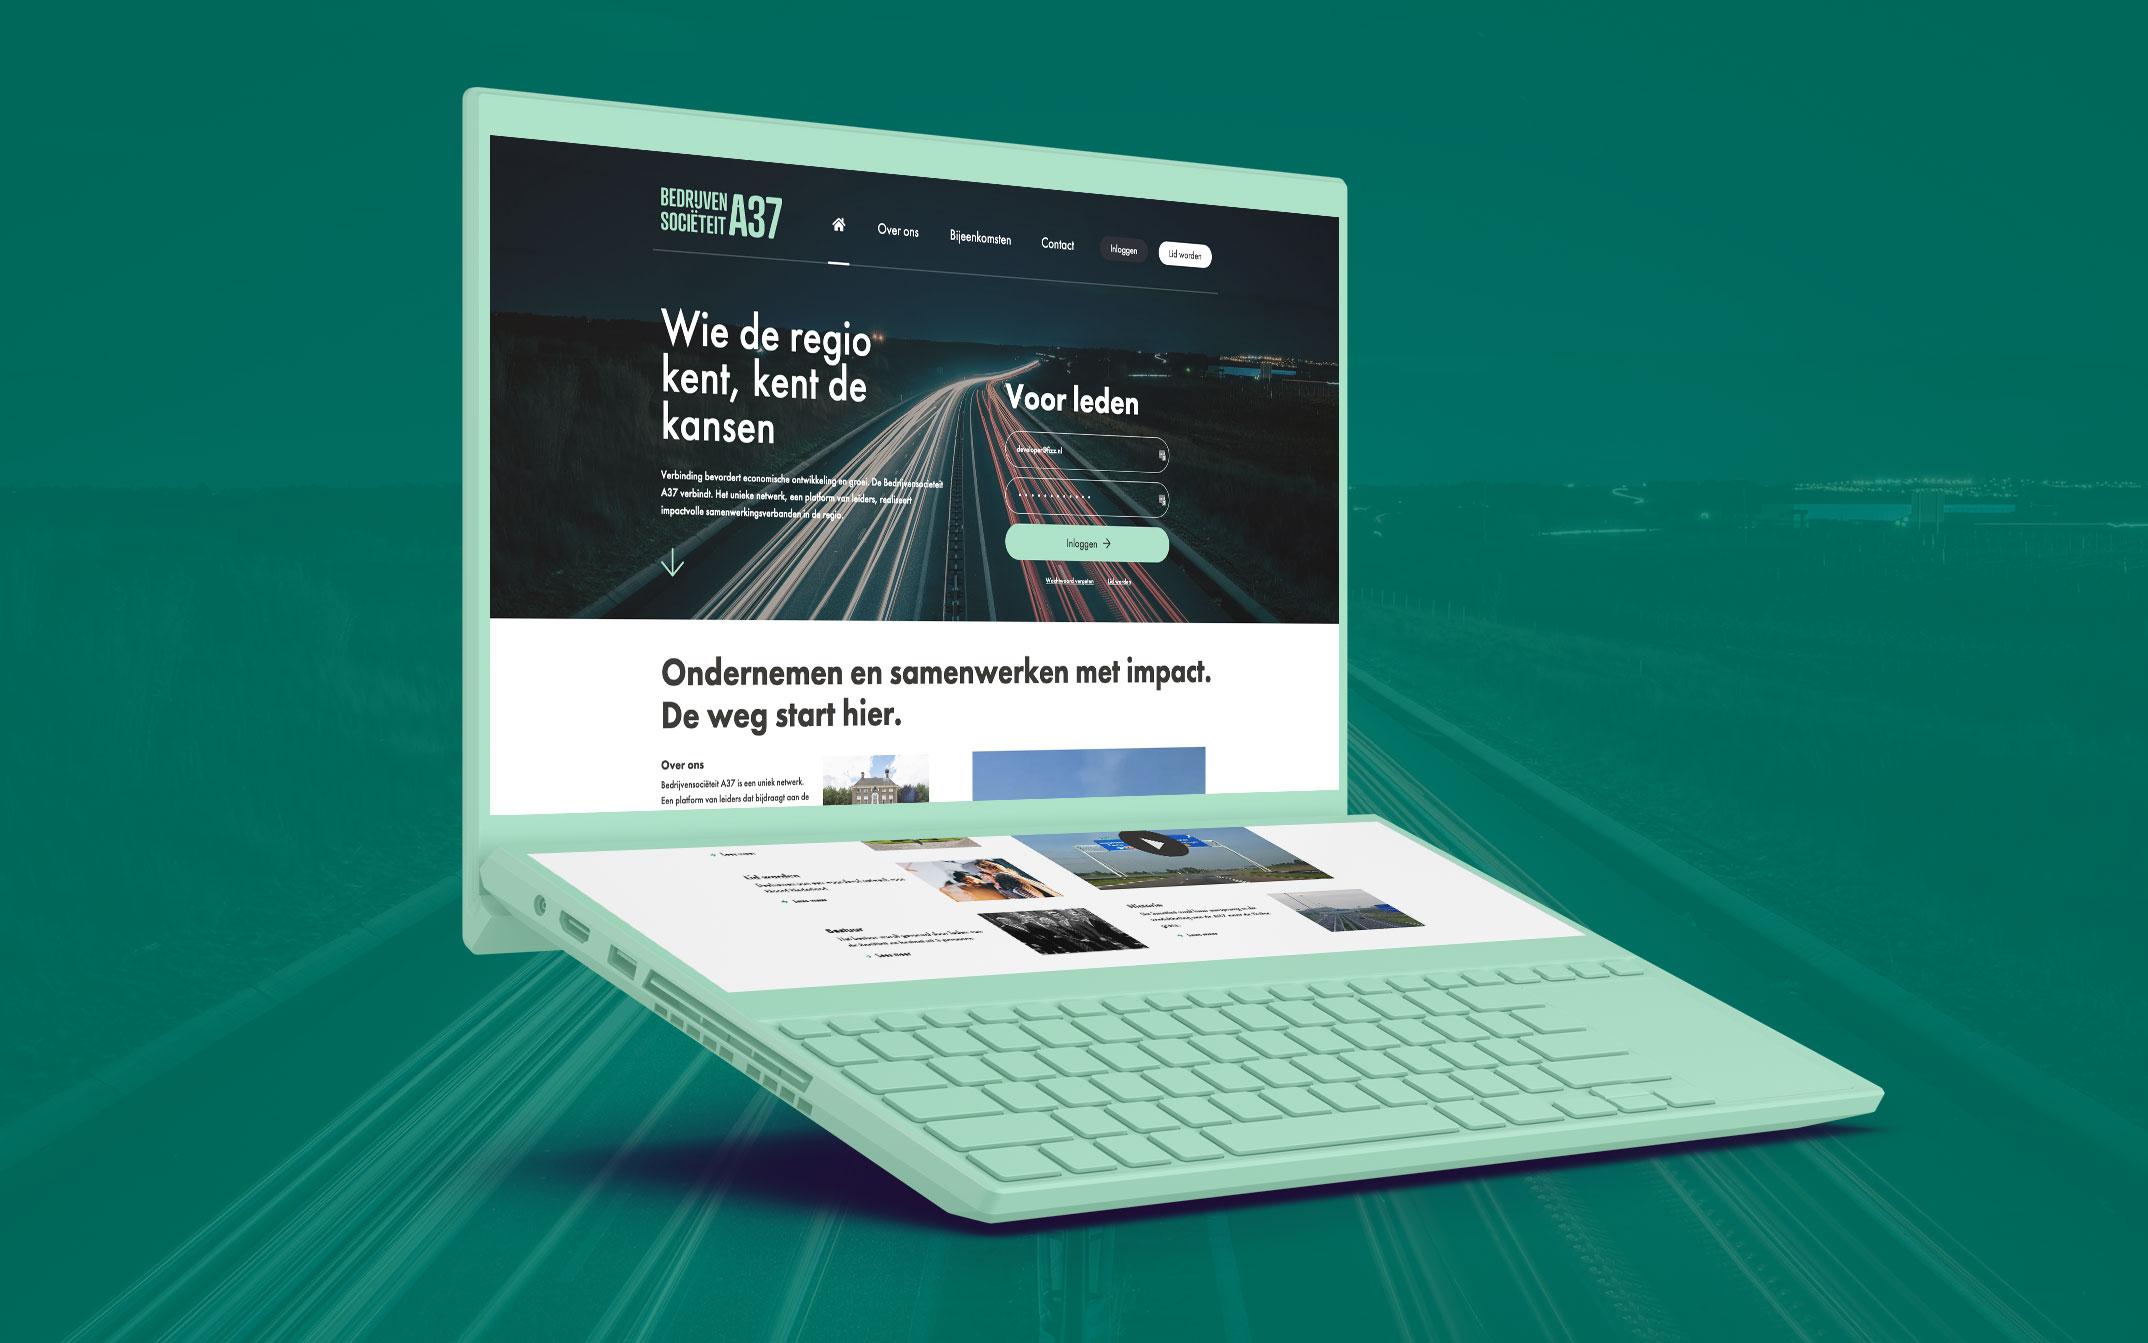 Bedrijvensocieteit A37 - Website